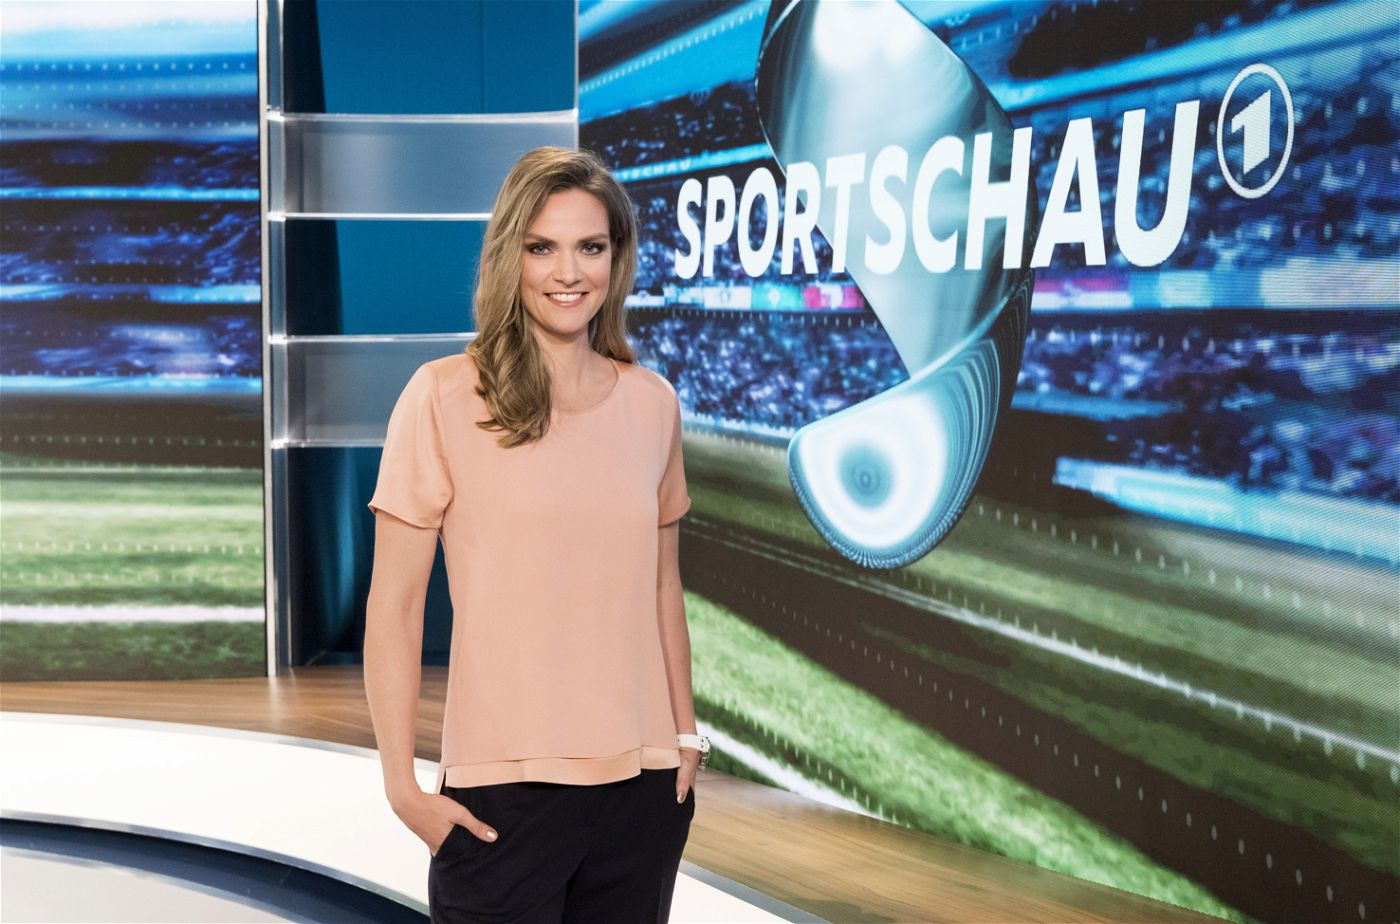 Sportschau 3. Liga Live Stream